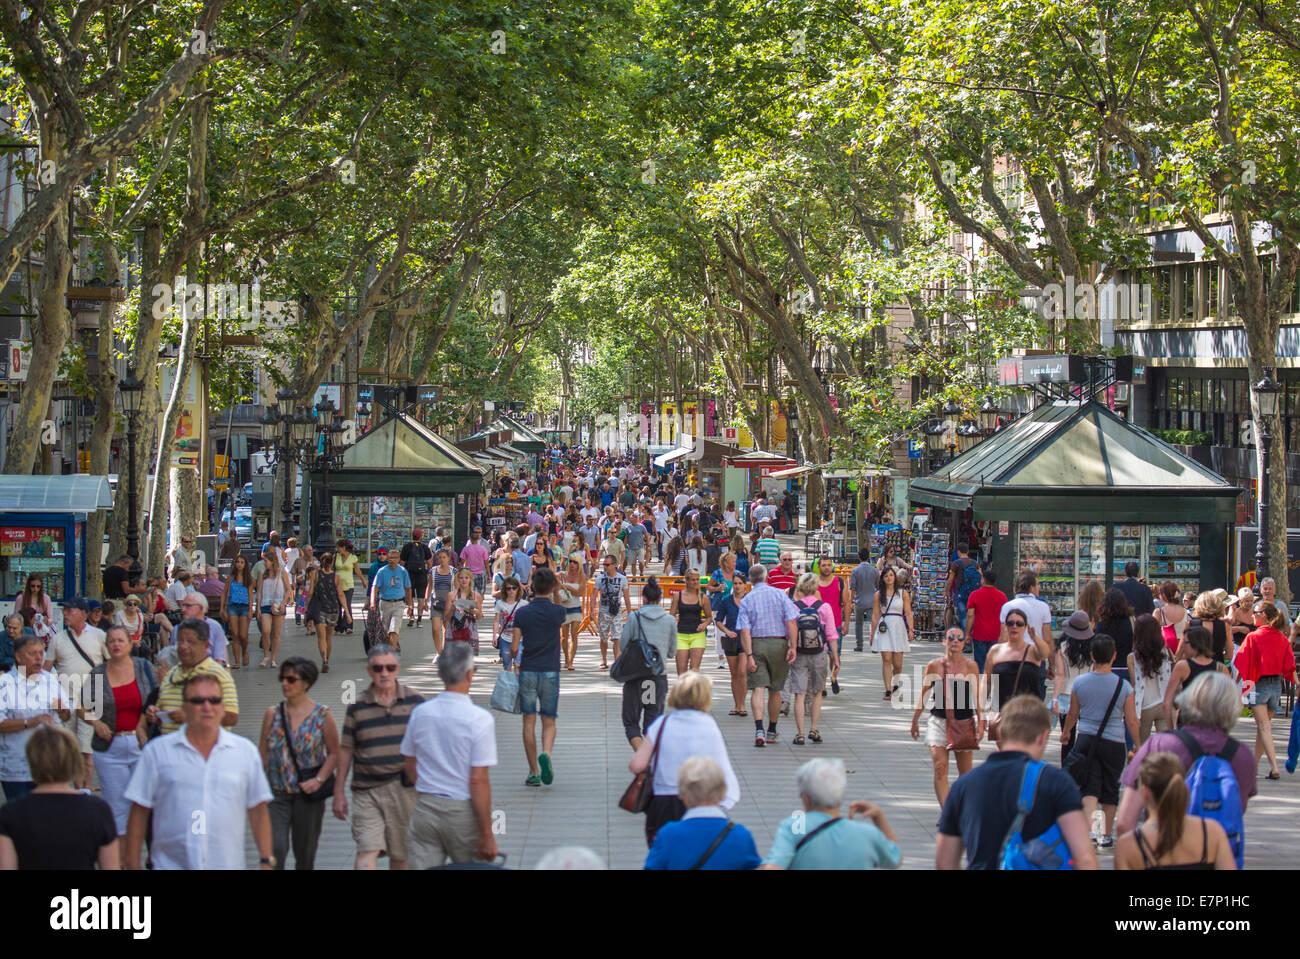 Barcelona, City, Ramblas, avenue, Catalonia, crowded, famous, green, kiosk, people, popular, Spain, Europe, touristic, - Stock Image